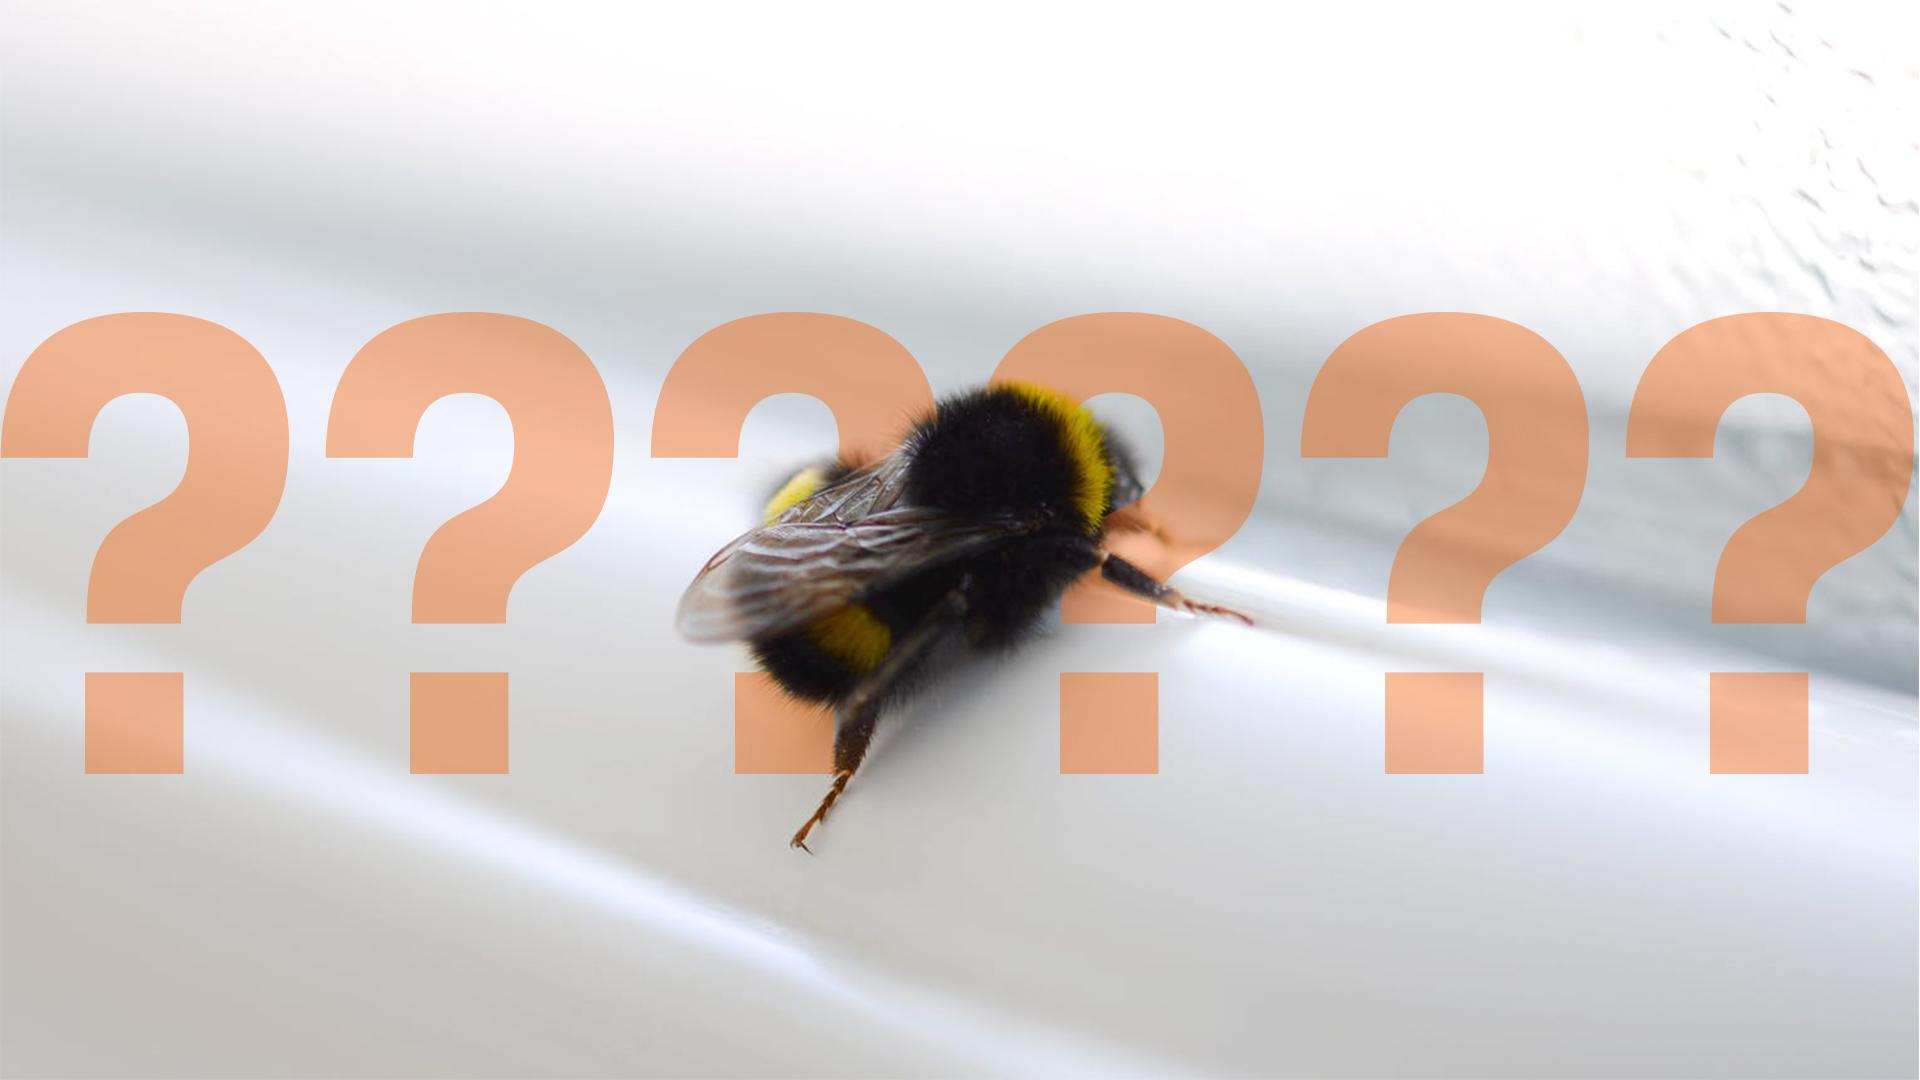 A bee on a windowsill